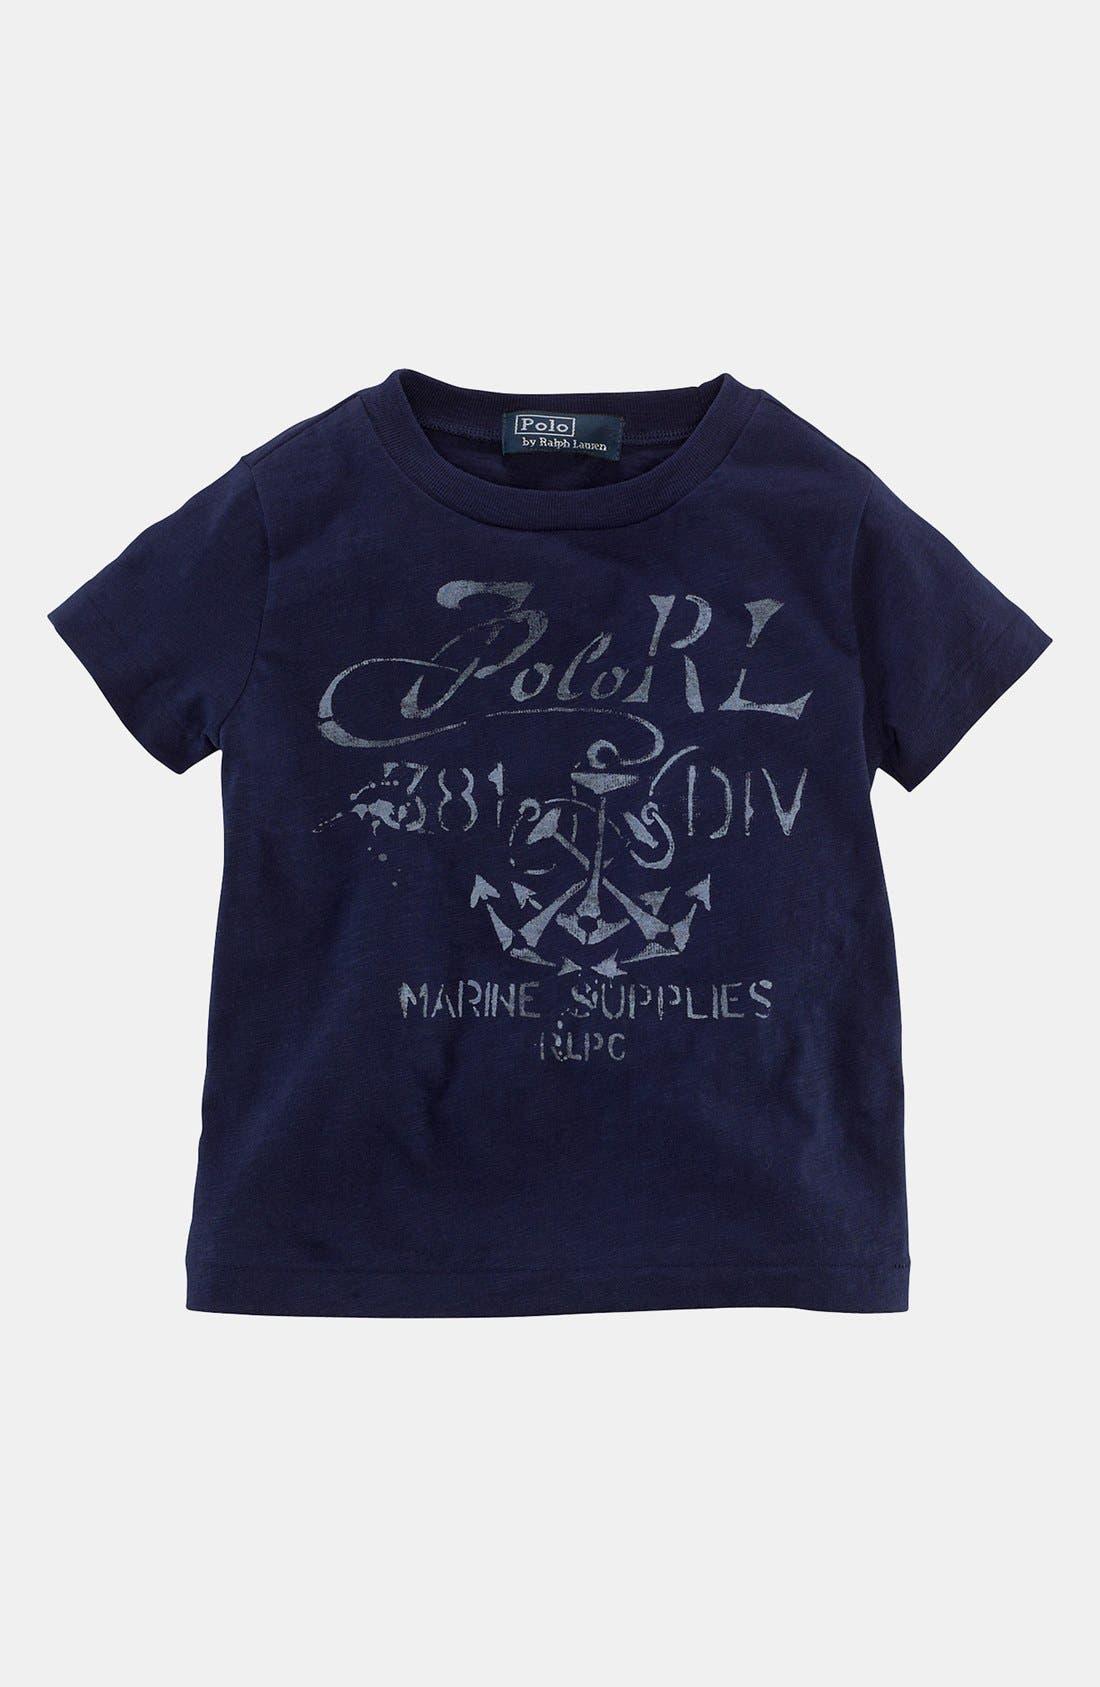 Alternate Image 1 Selected - Ralph Lauren Graphic T-Shirt (Baby Boys)